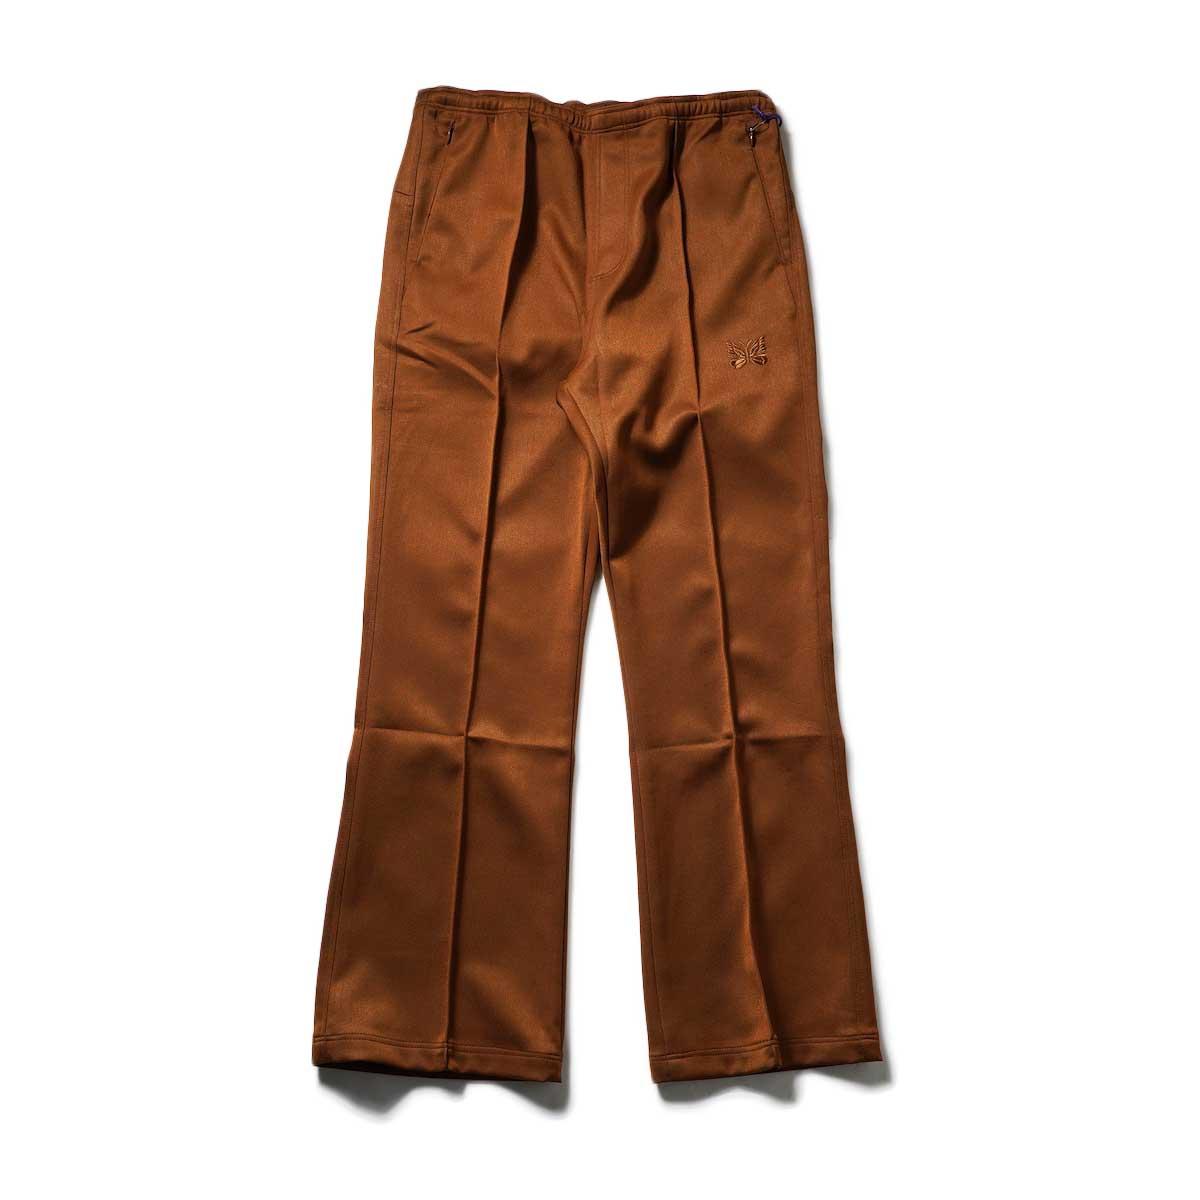 Needles / W.U. BOOT-CUT PANT - PE/R DOESKIN (Brown)正面